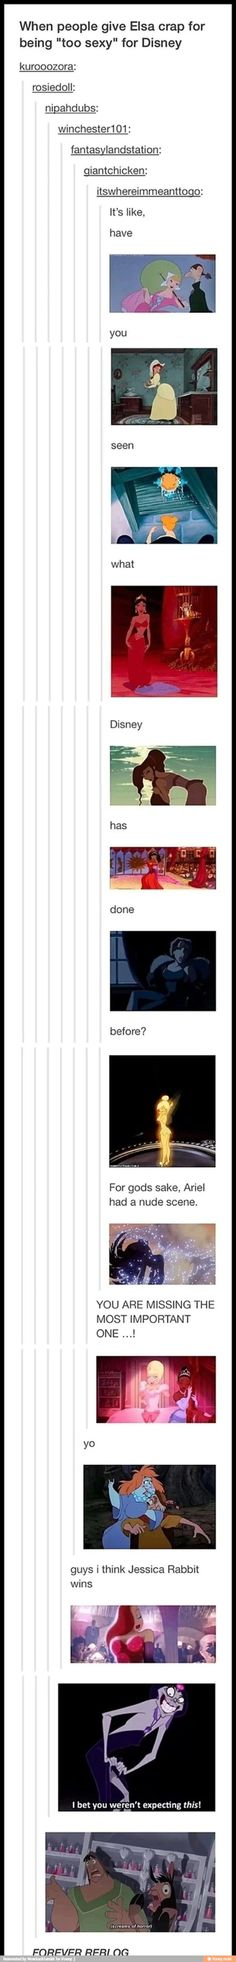 ★ // Follow @GiaStyle // ★ Disney Memes, Funny Disney, Disney Nerd, Disney Disney, Disney Cartoons, Disney Fails, Disney Magic, Disney Love, Evil Disney